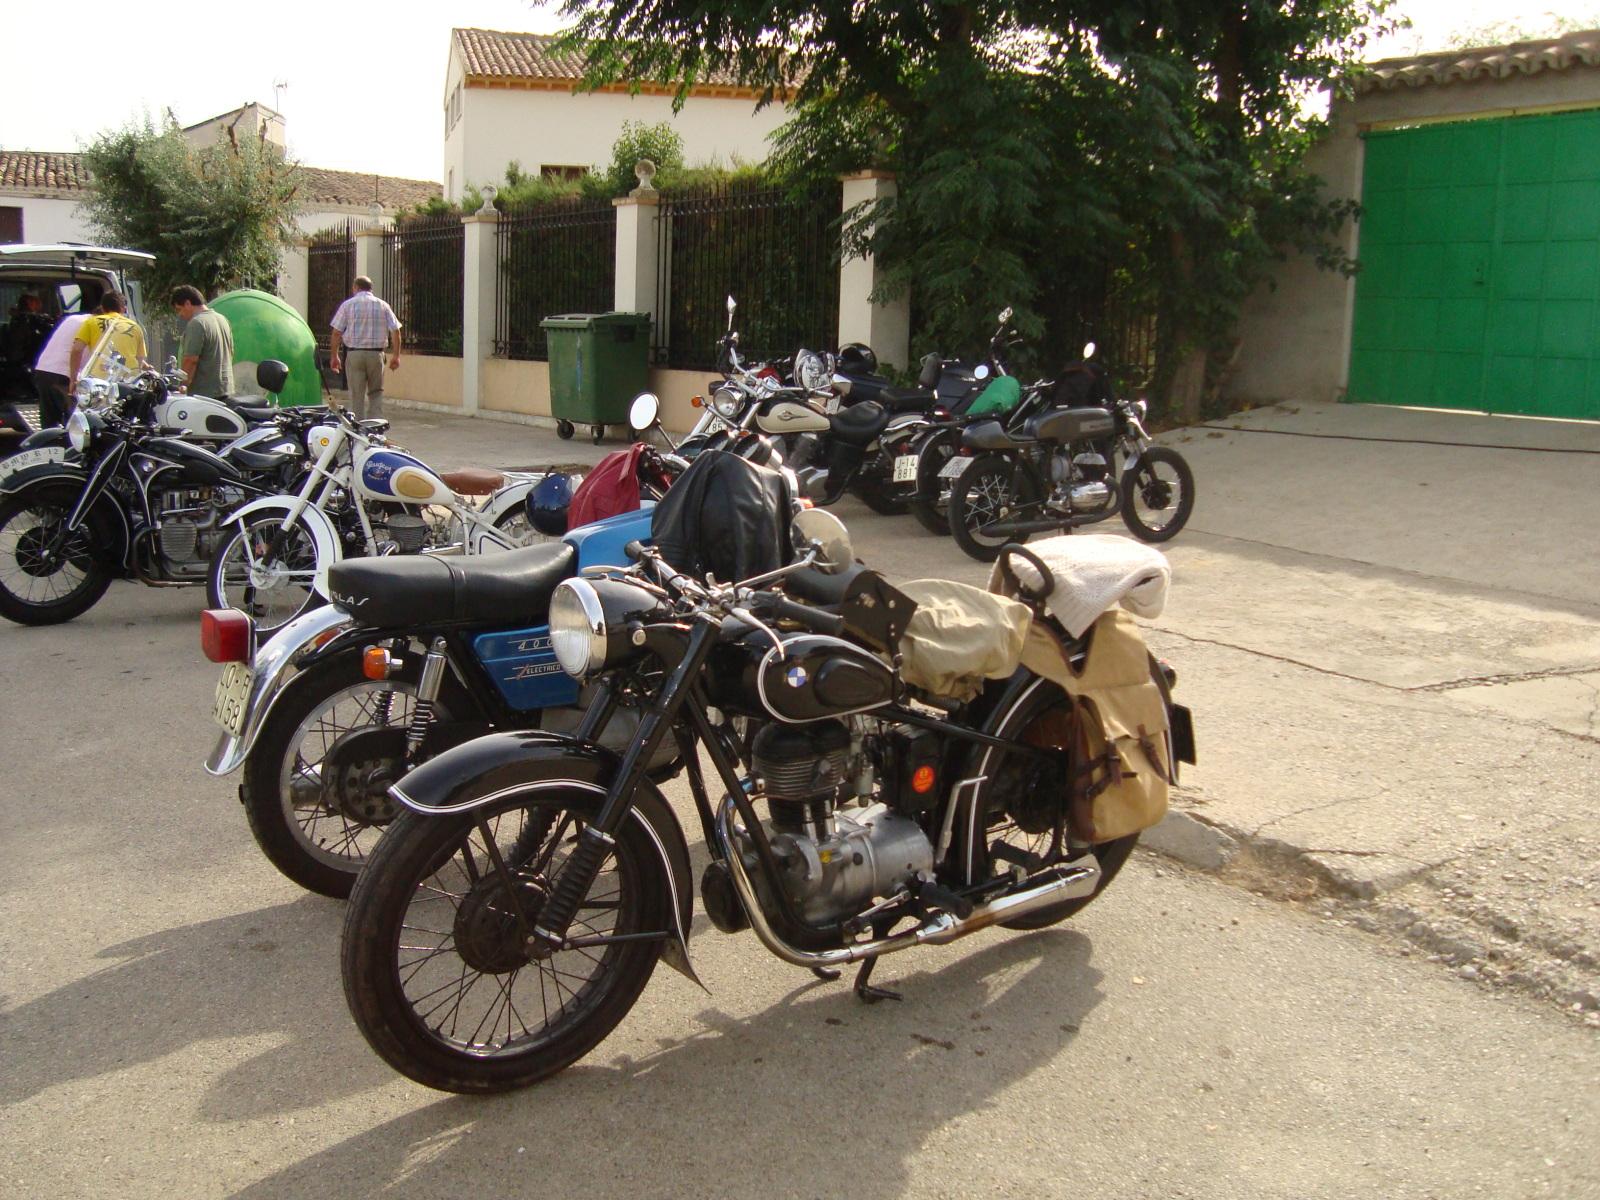 XI concentracion de motos antiguas en Alberuela de tubo (Huesca) 33ue4gn